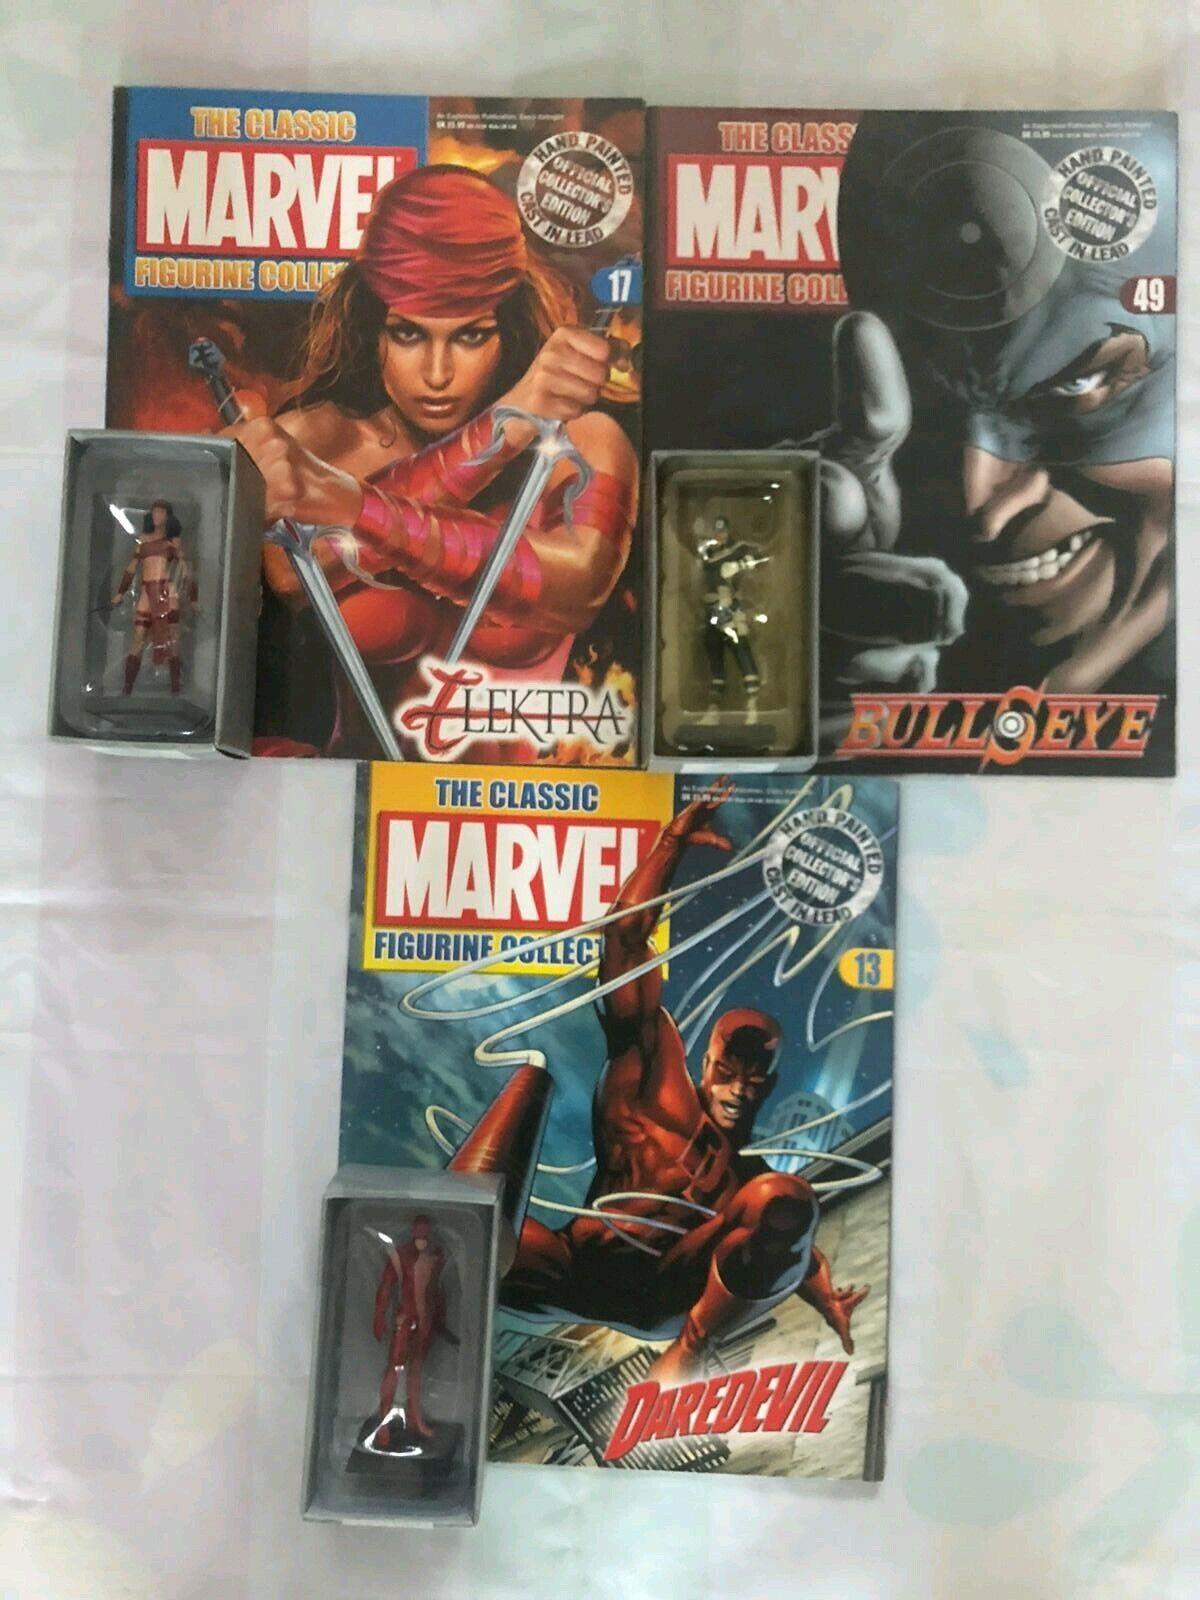 Eaglemoss Elektra Daredevil Bullseye Classic Marvel Figurine Collection+Mag